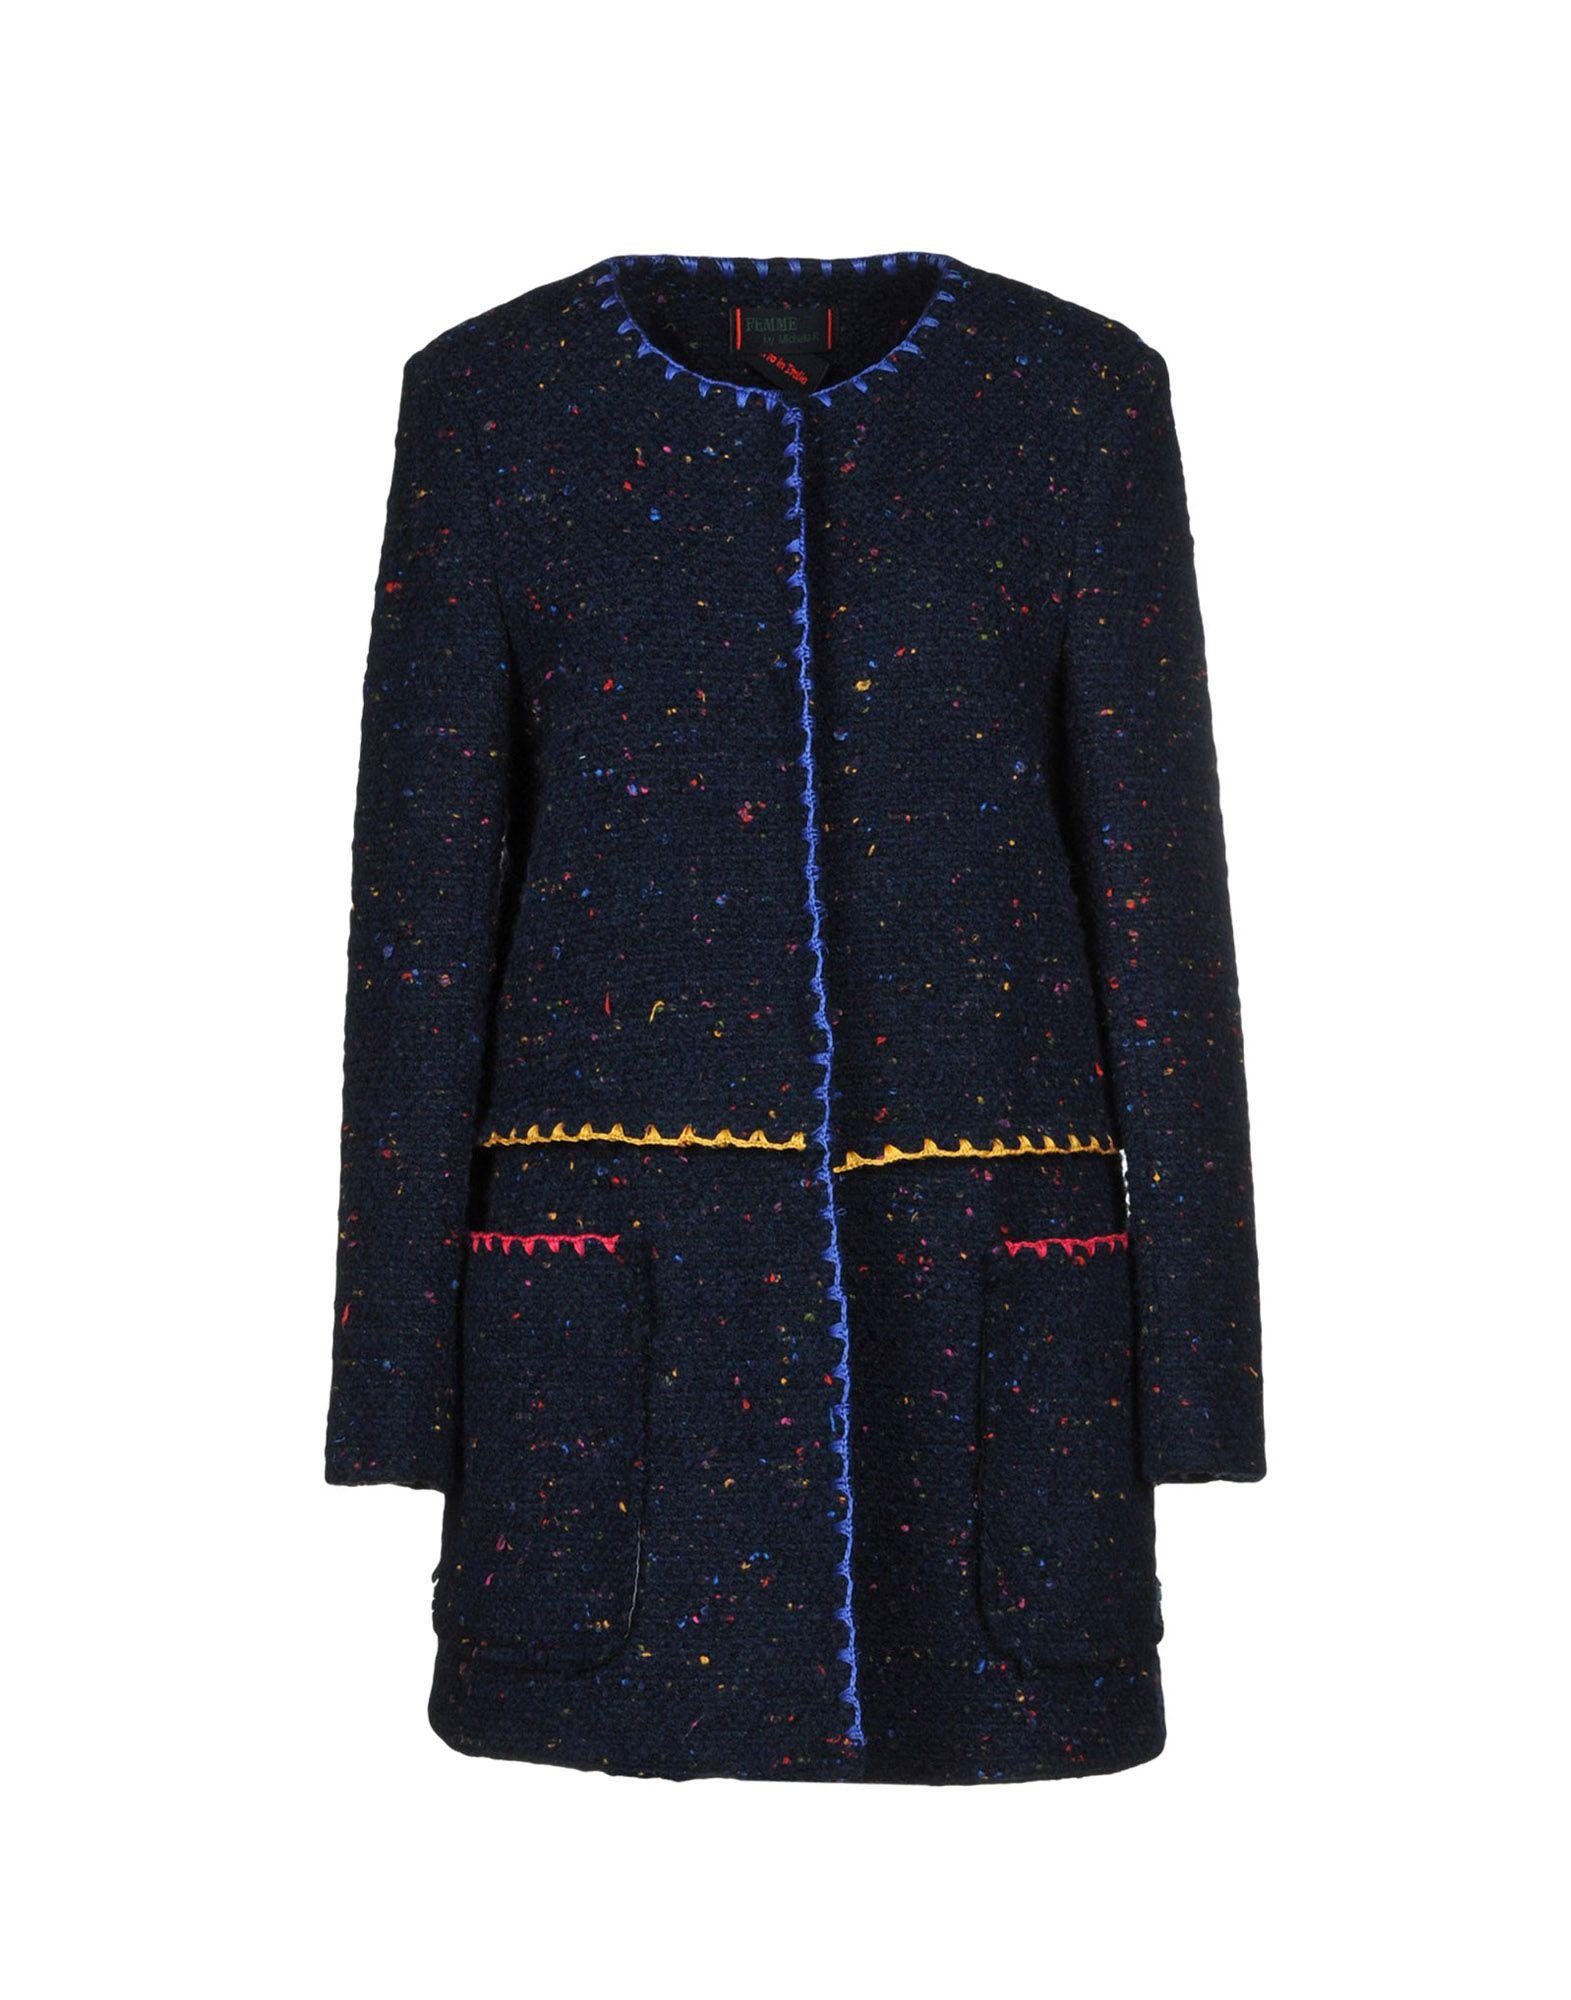 FEMME BY MICHELE ROSSI Coat in Dark Blue